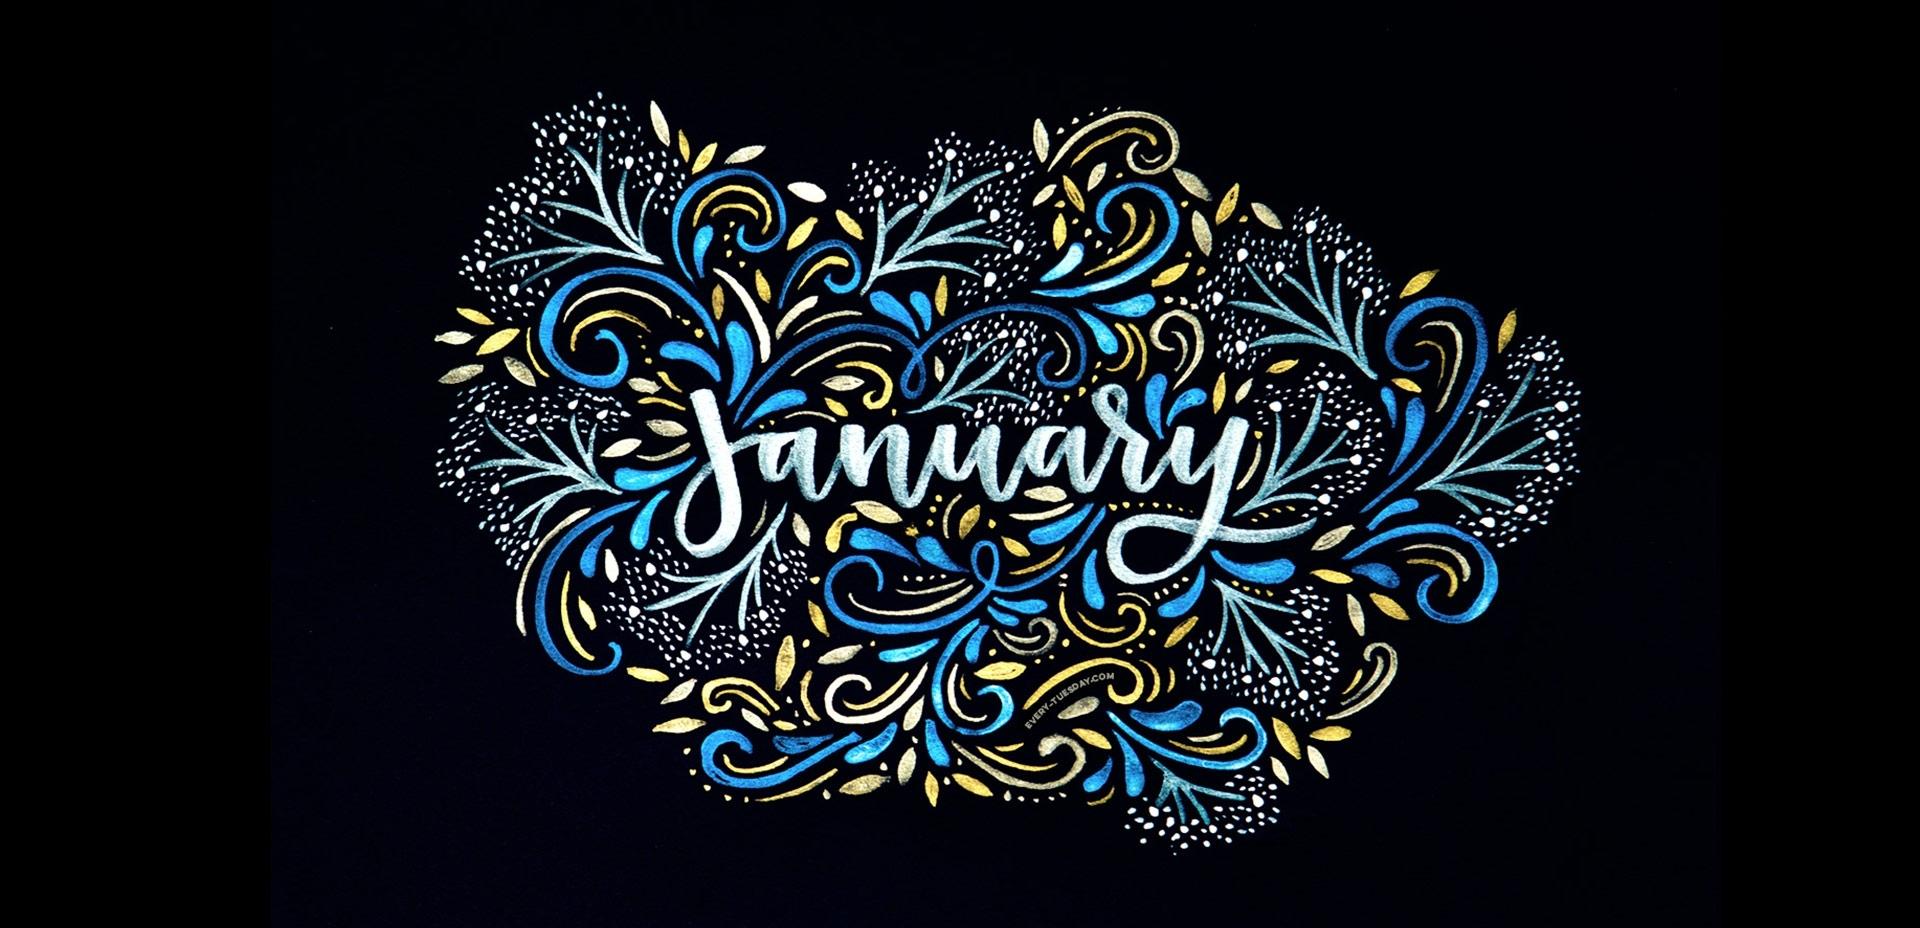 freebie: january 2017 desktop wallpapers - every-tuesday